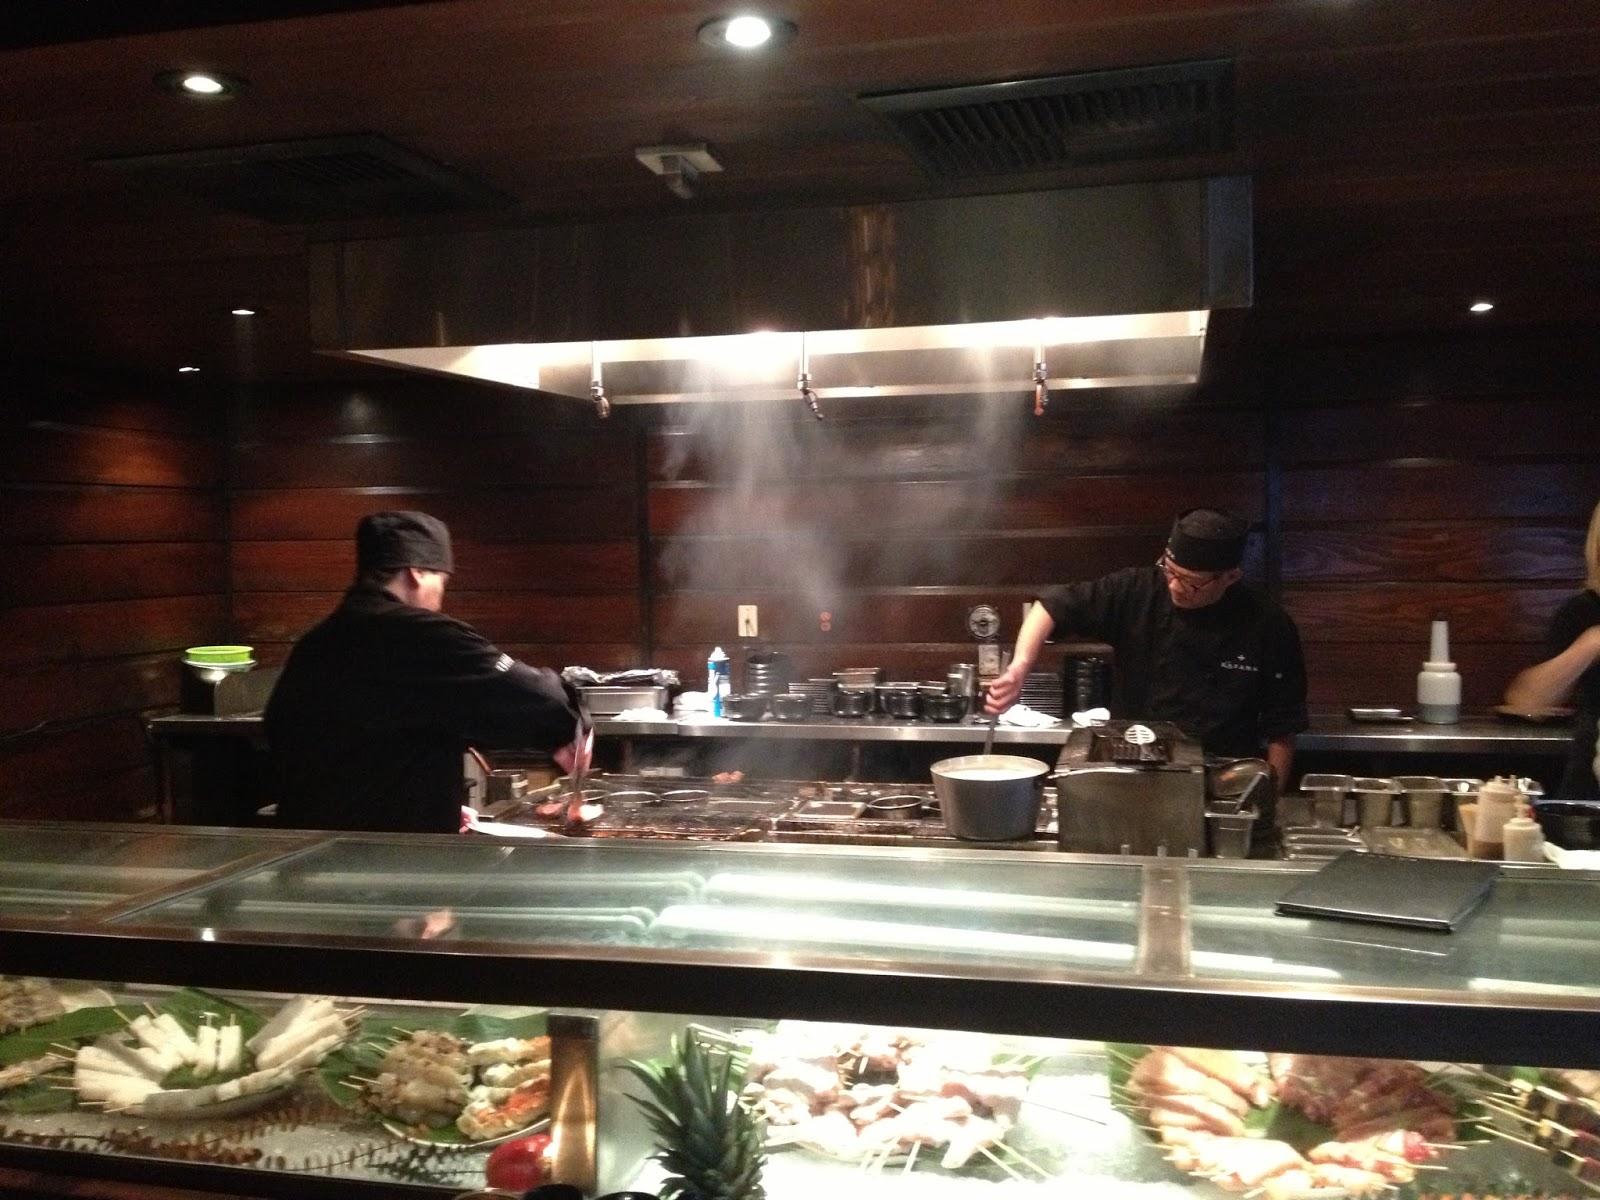 Katana binchotan charcoal robata grill